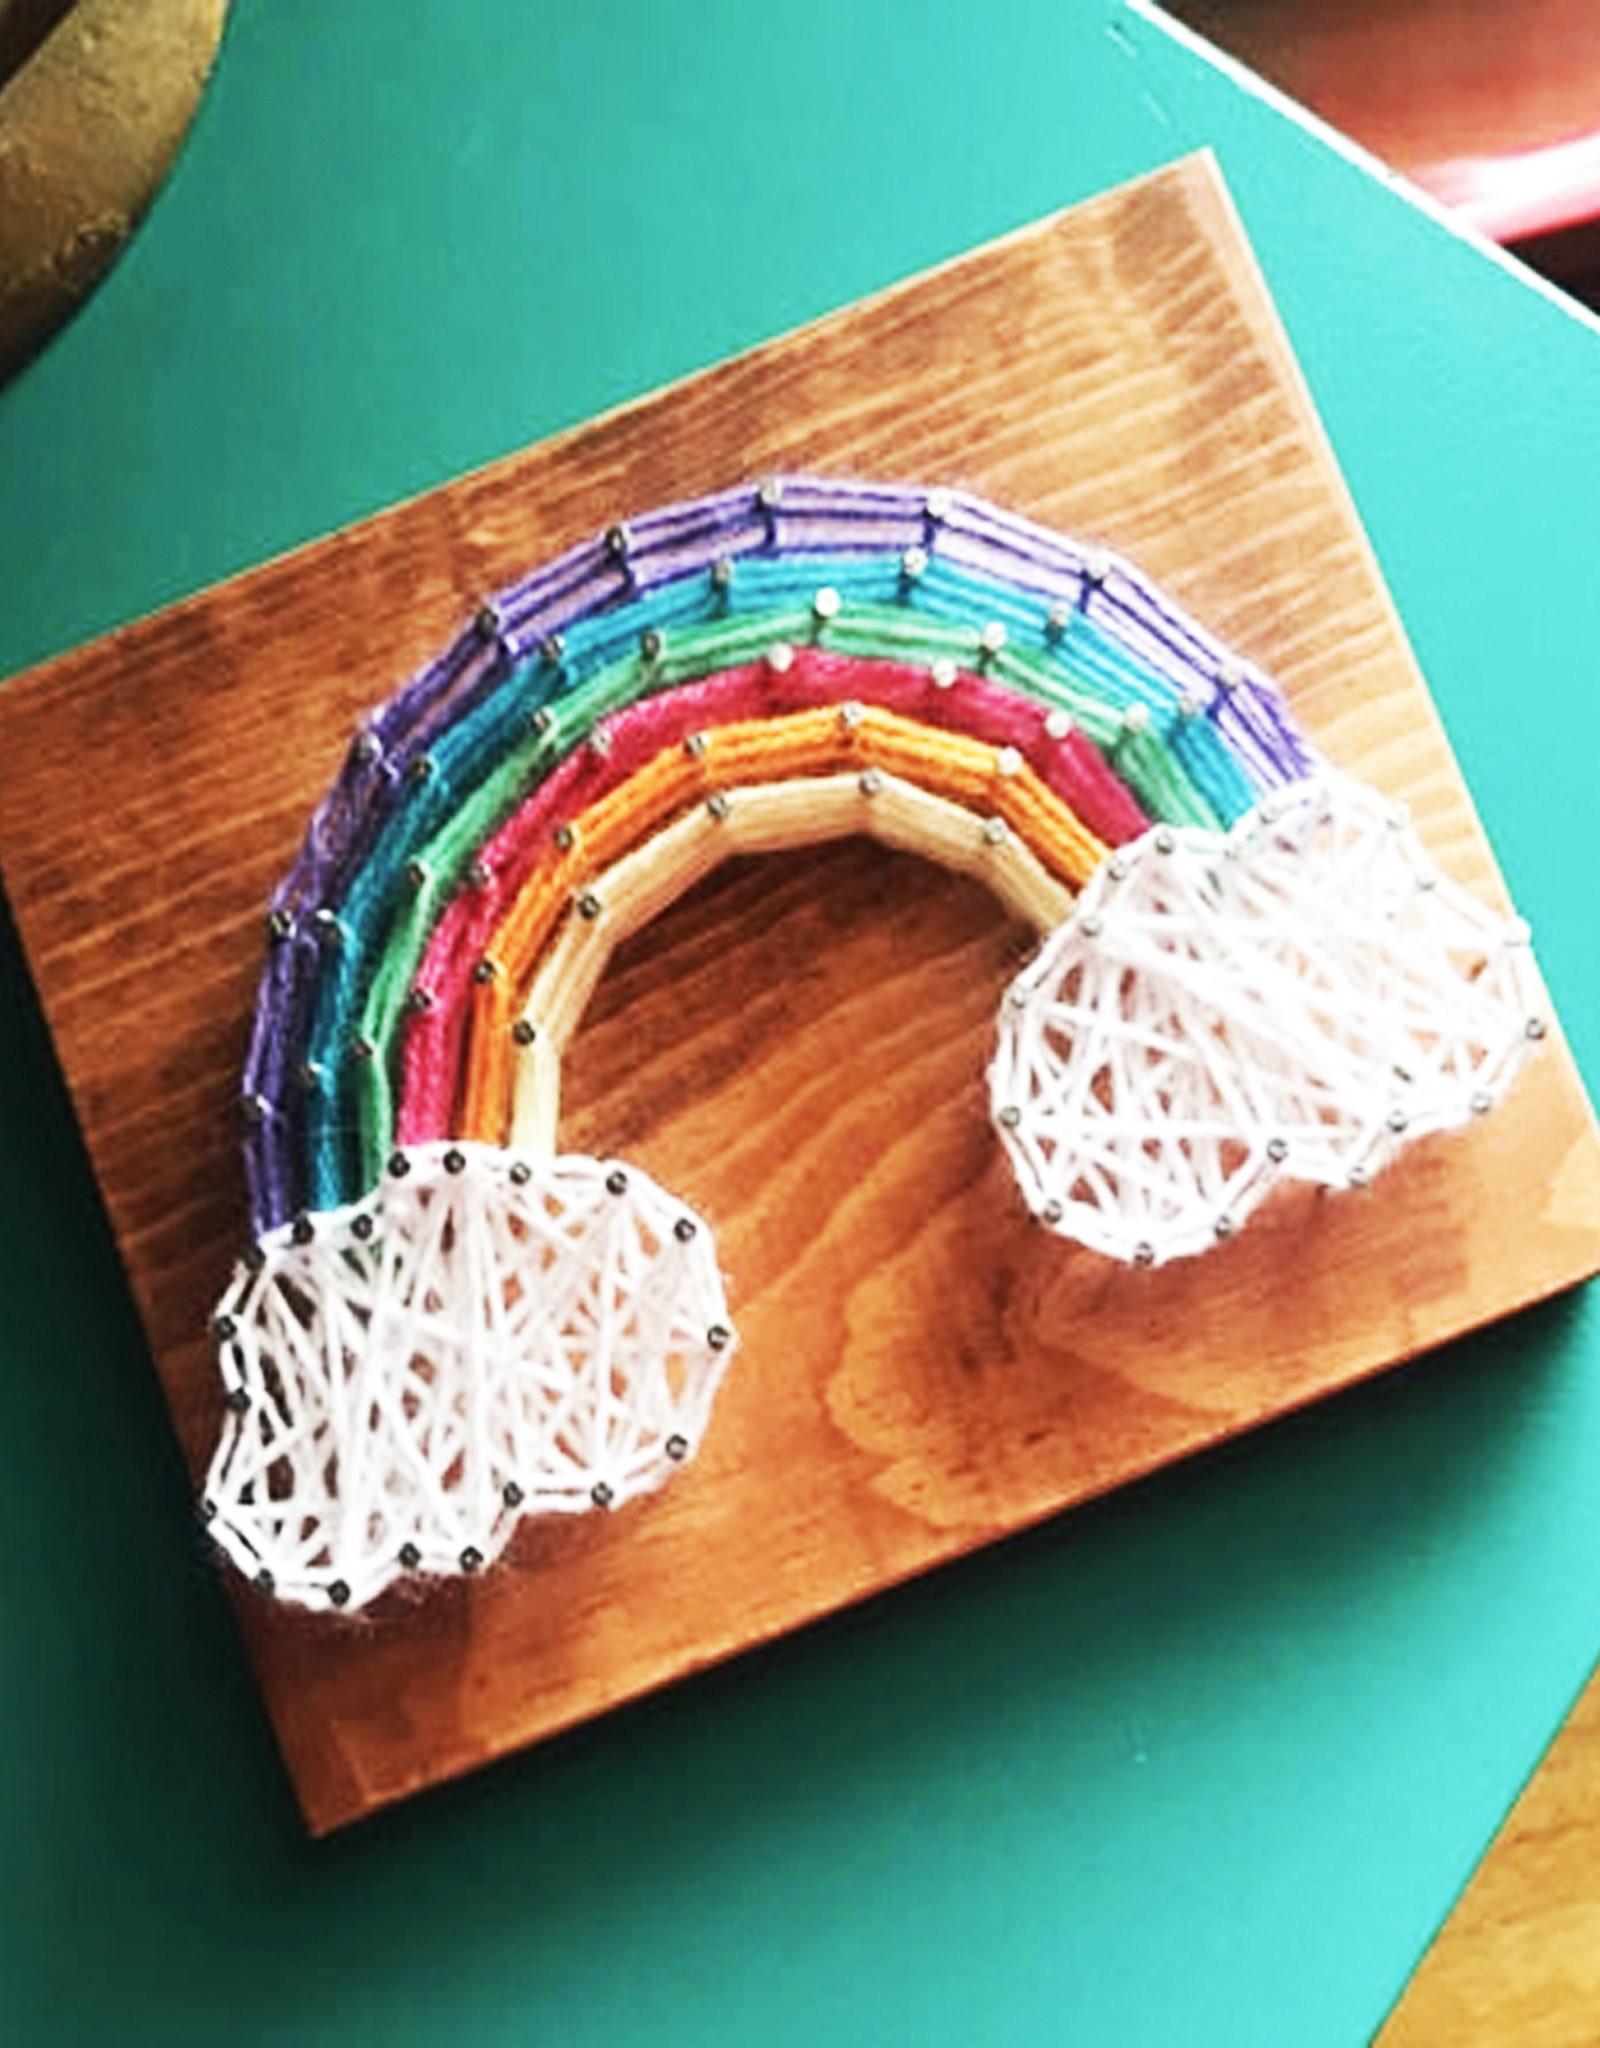 Strung By Shawna String Art Kit -  Rainbow